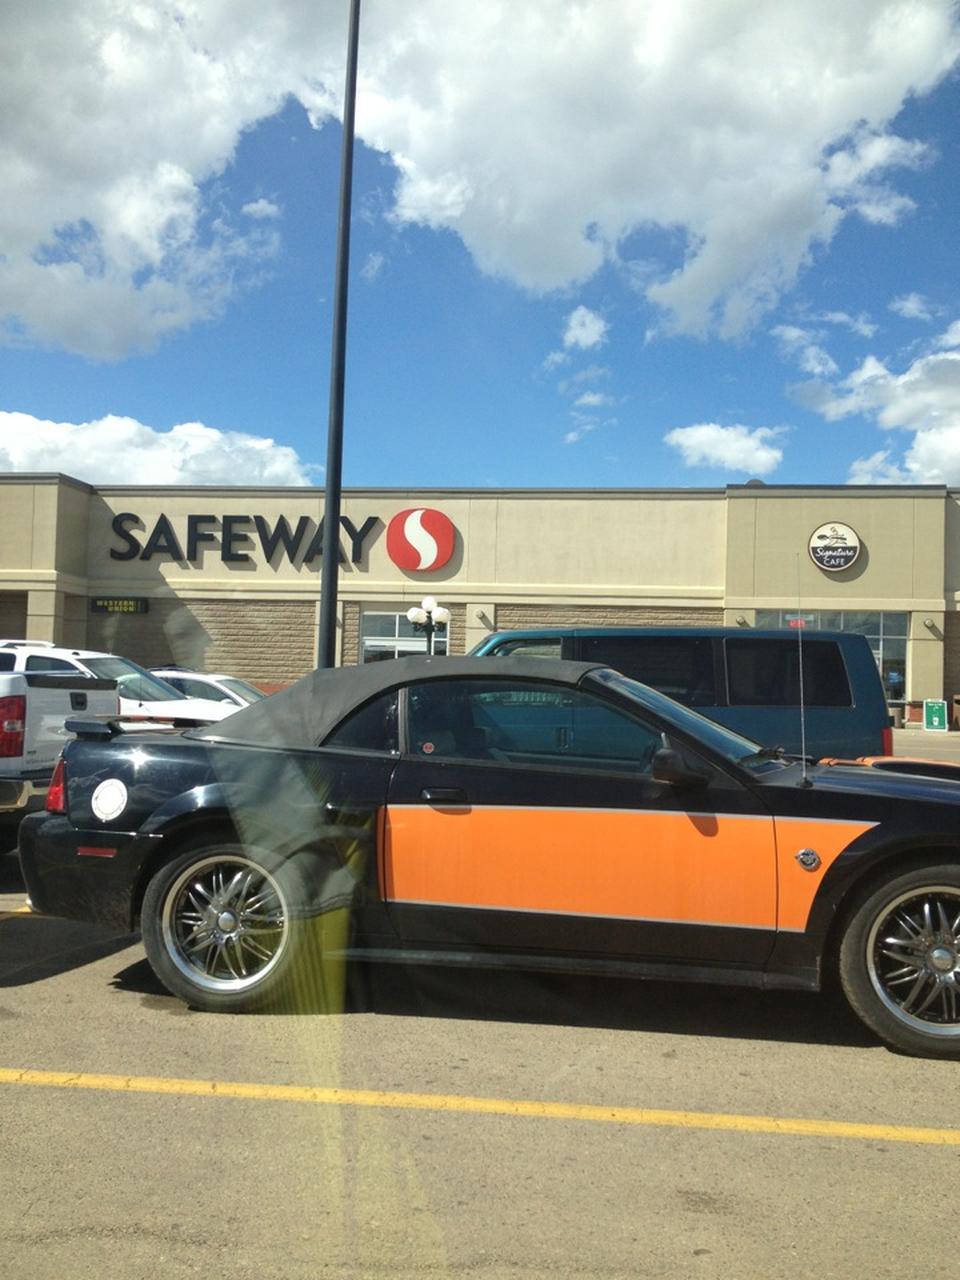 Safeway Pharmacy Cornerstone | health | 200-6800 48 Ave, Camrose, AB T4V 4T1, Canada | 7806721680 OR +1 780-672-1680